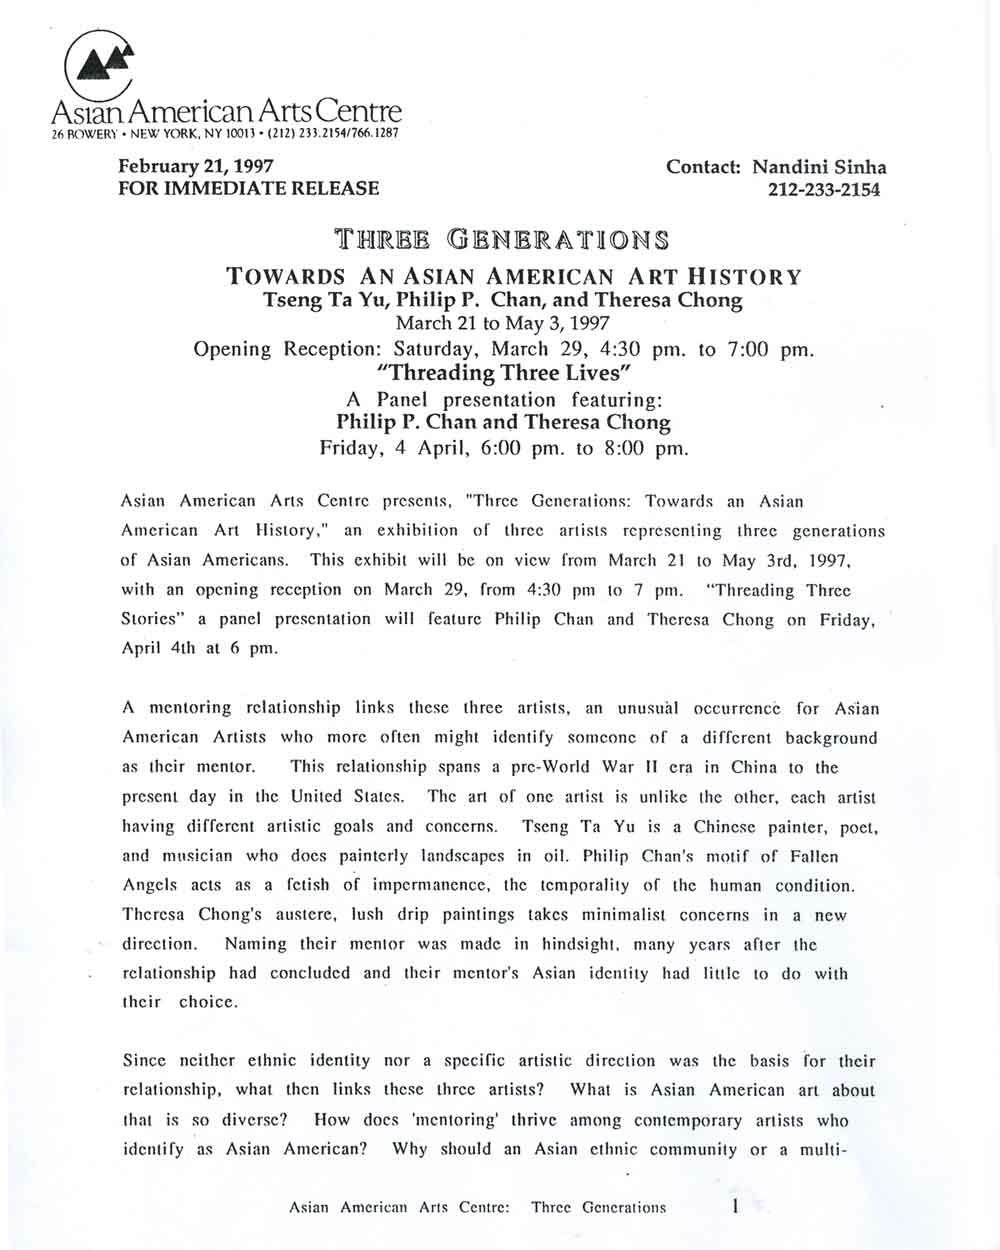 Three Generations press release, pg 1